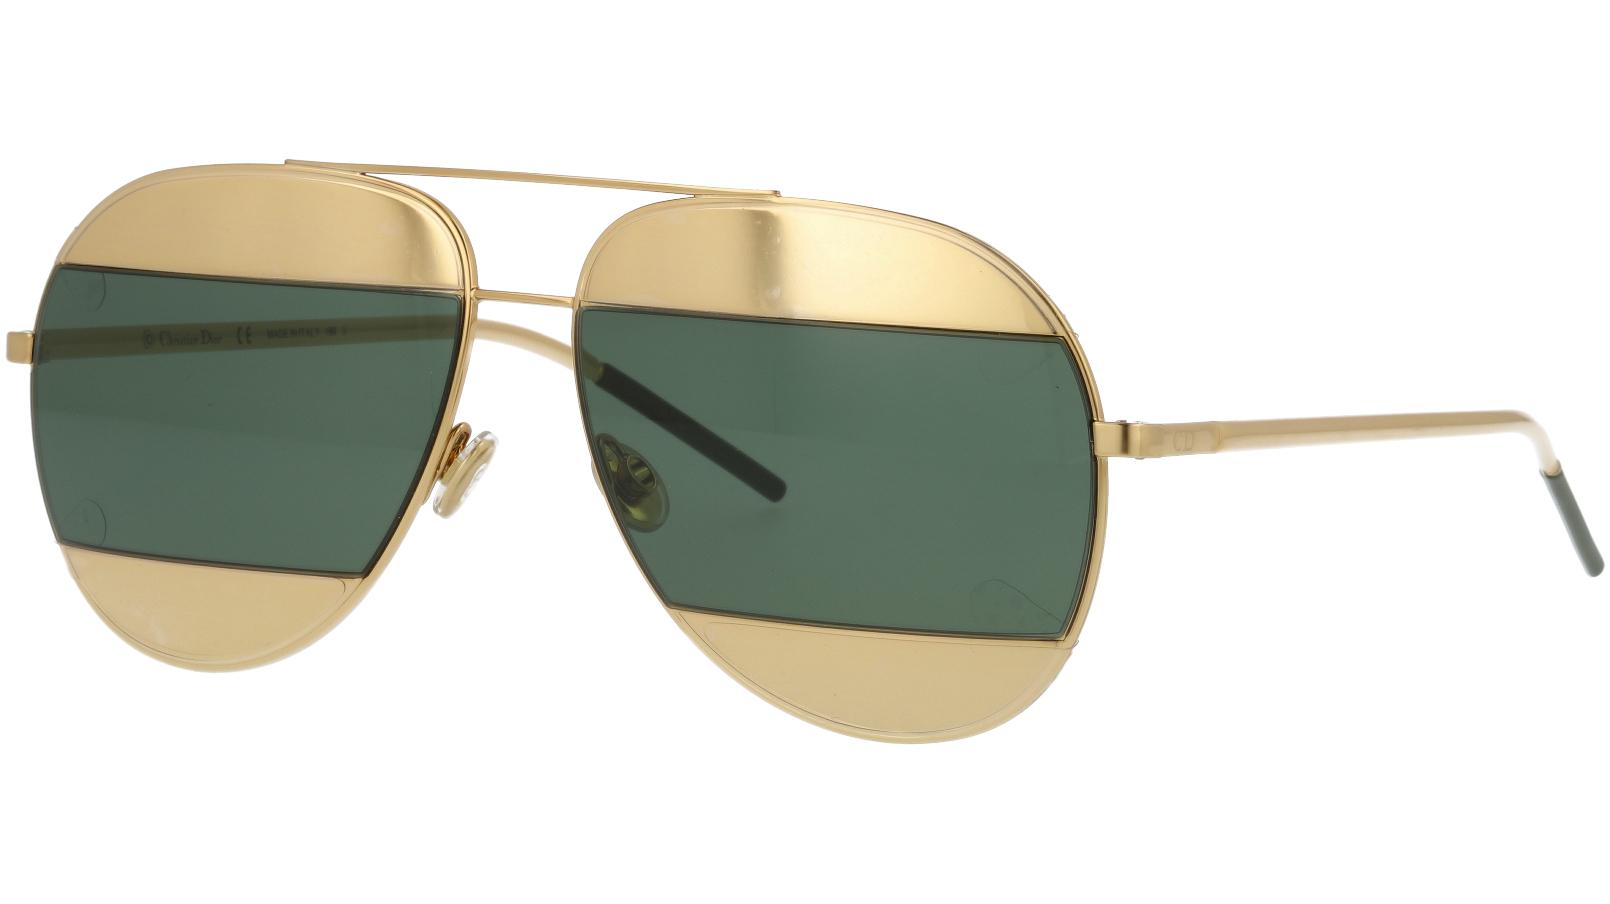 DIOR DIORSPLIT1 000B5 59 ROSE Sunglasses